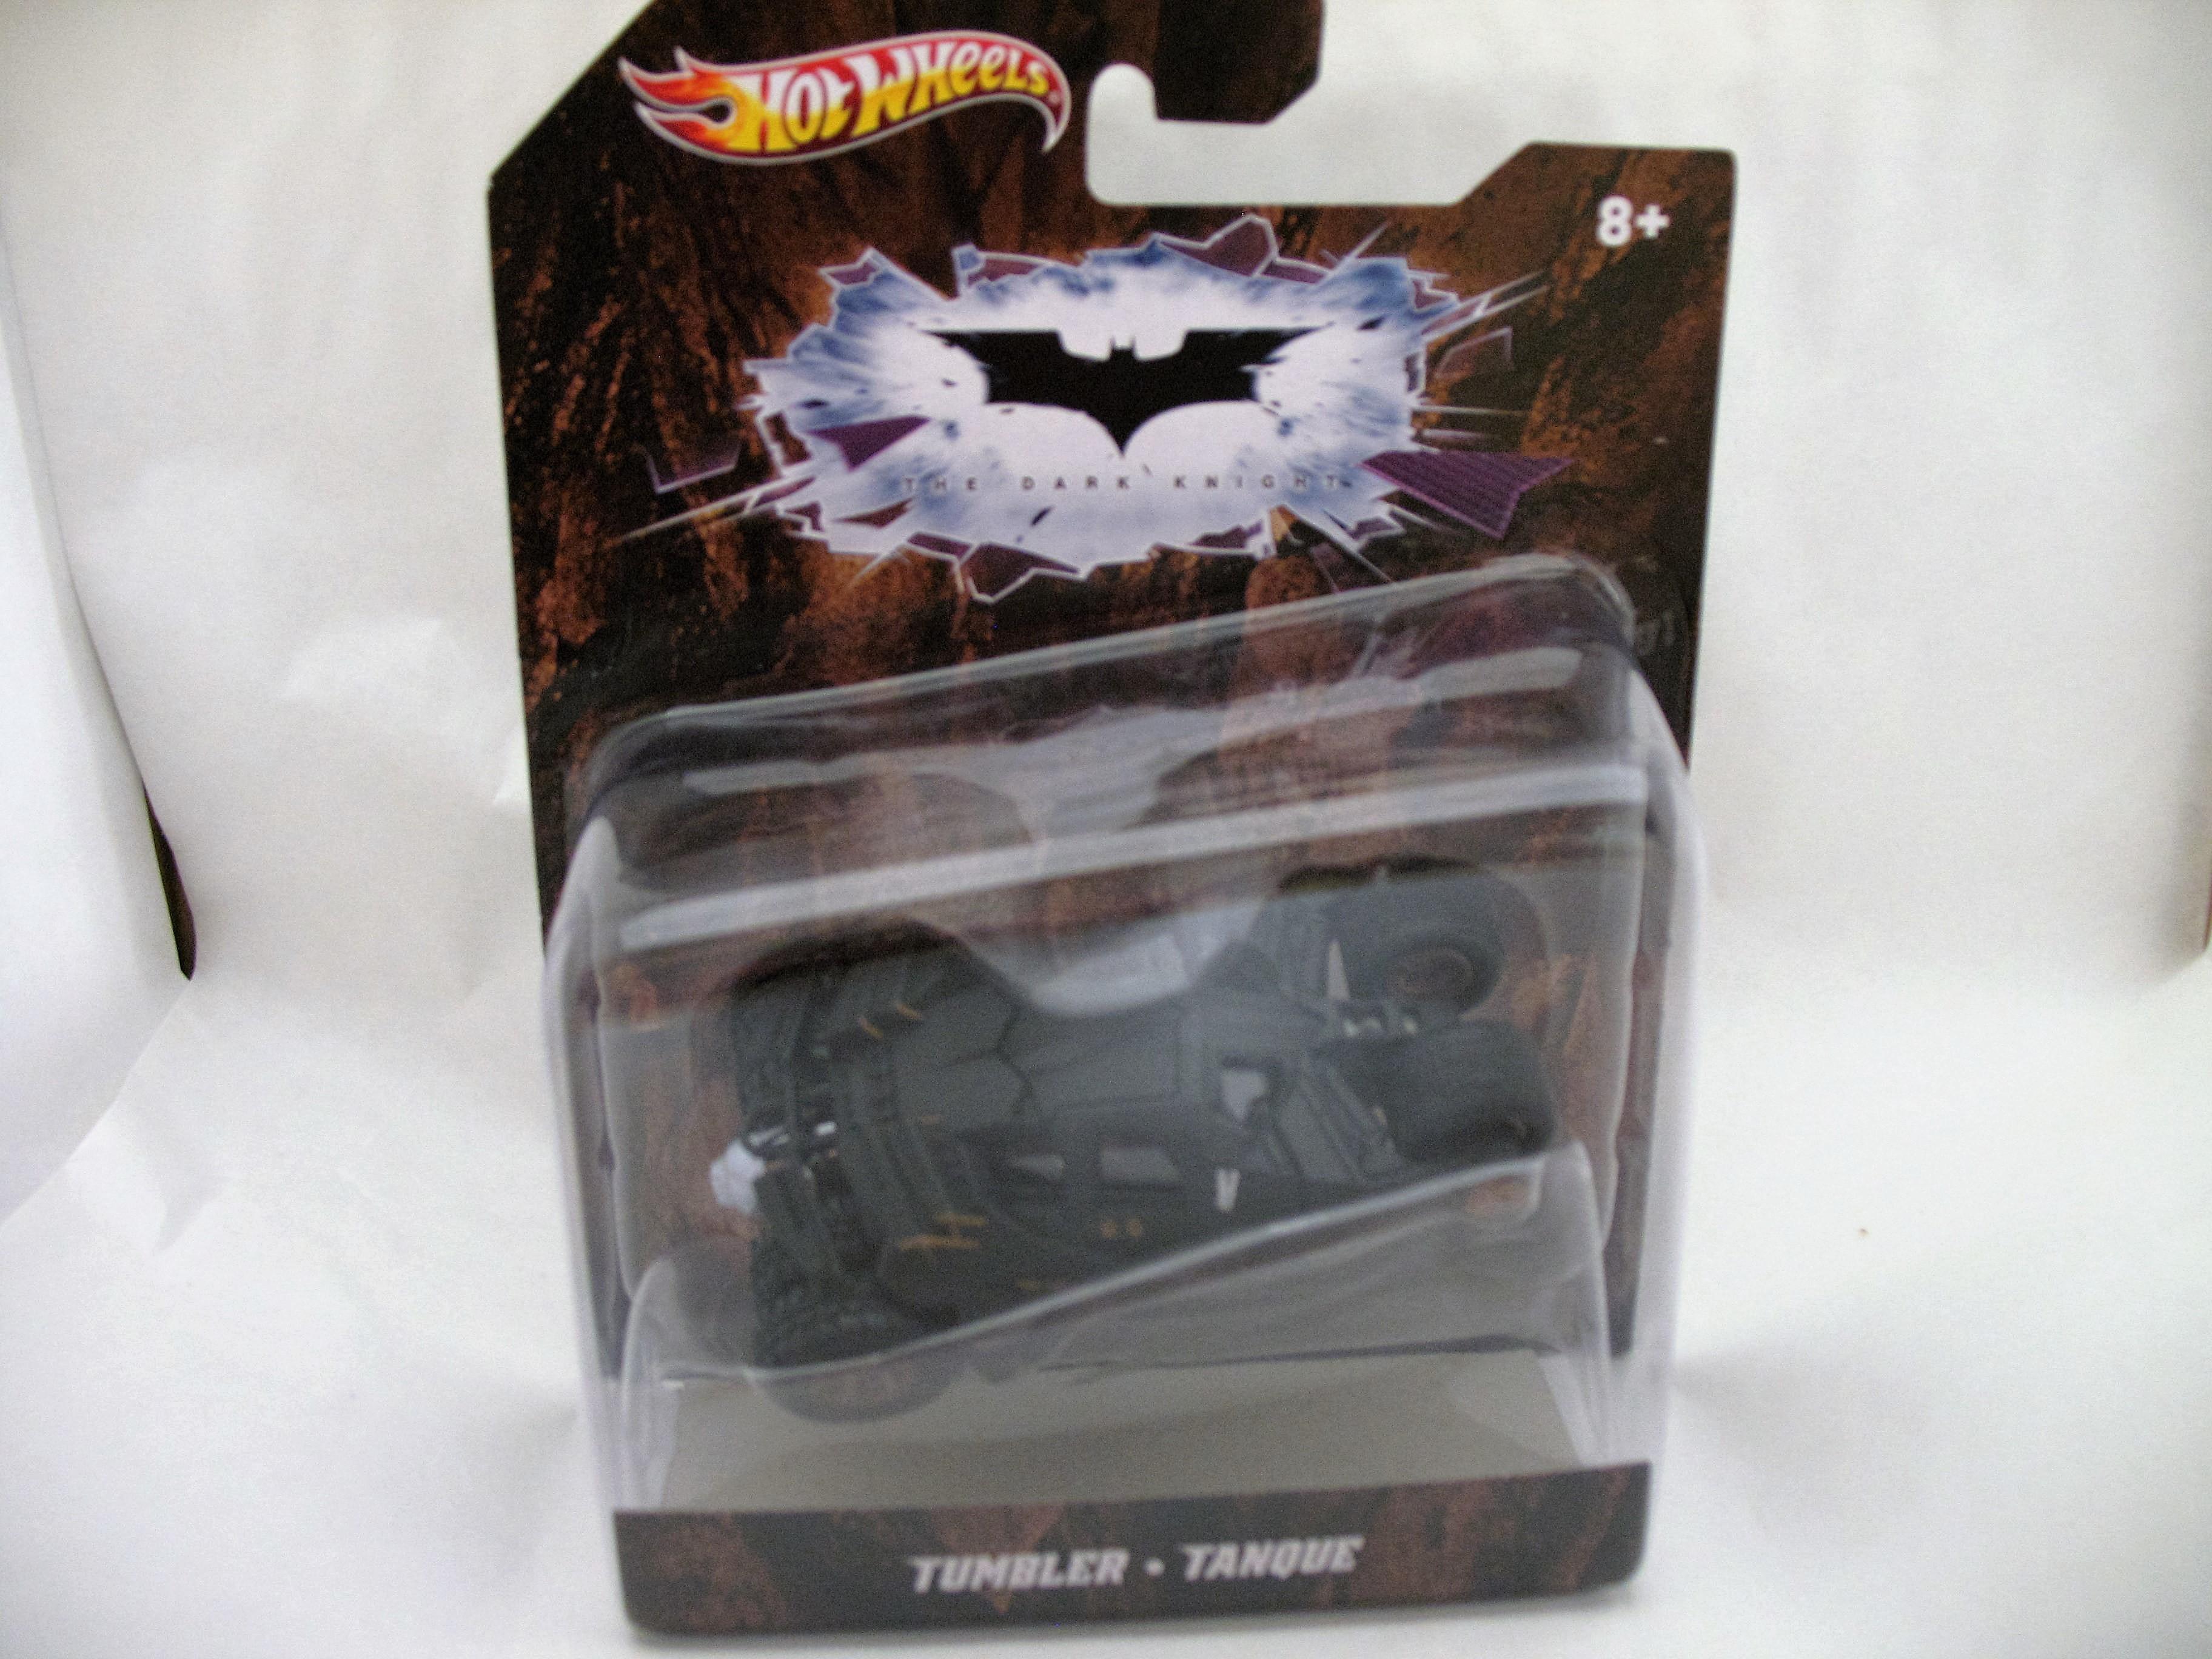 Filme Do Hot Wheels pertaining to hot wheels 2011 batman the dark knight black tumbler x4034 1:50